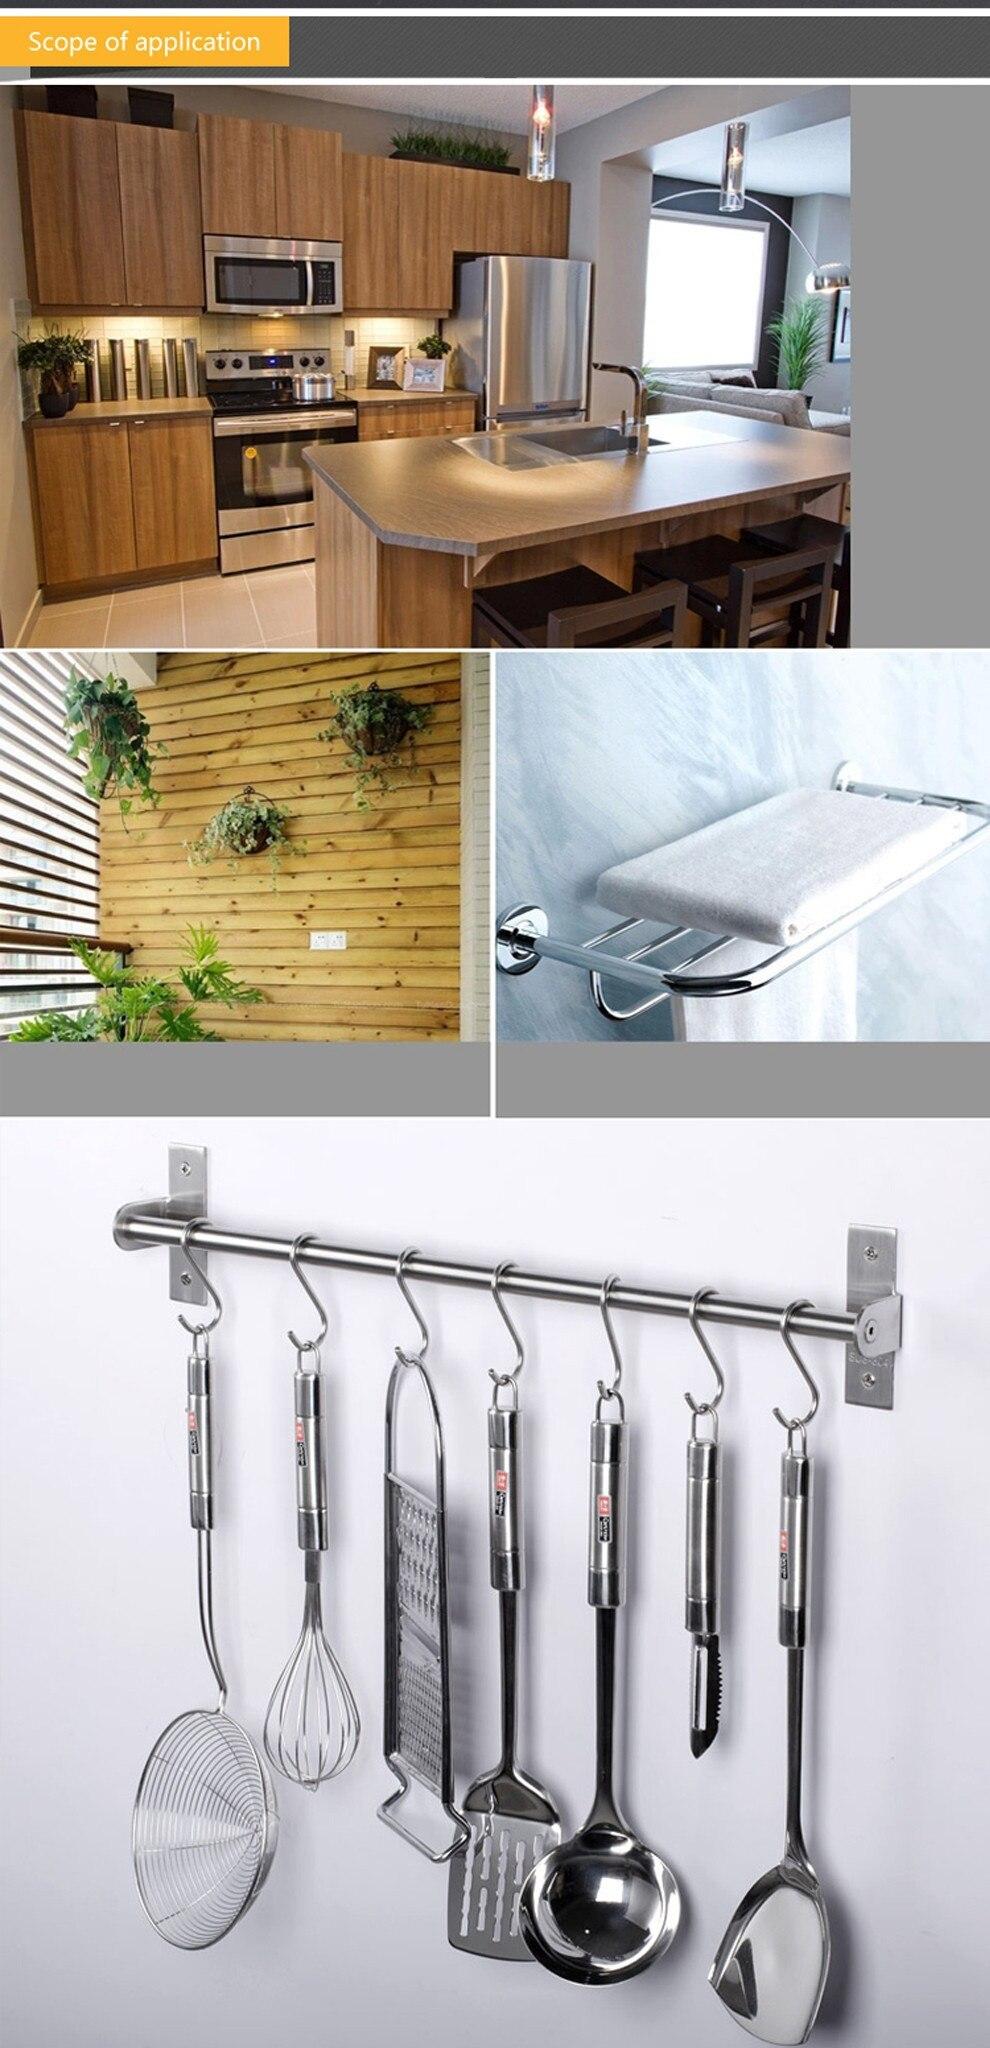 10 Pack Stainless Steel S Hooks Hanging Rail Pot Pan Hanger Kitchen DIY Room